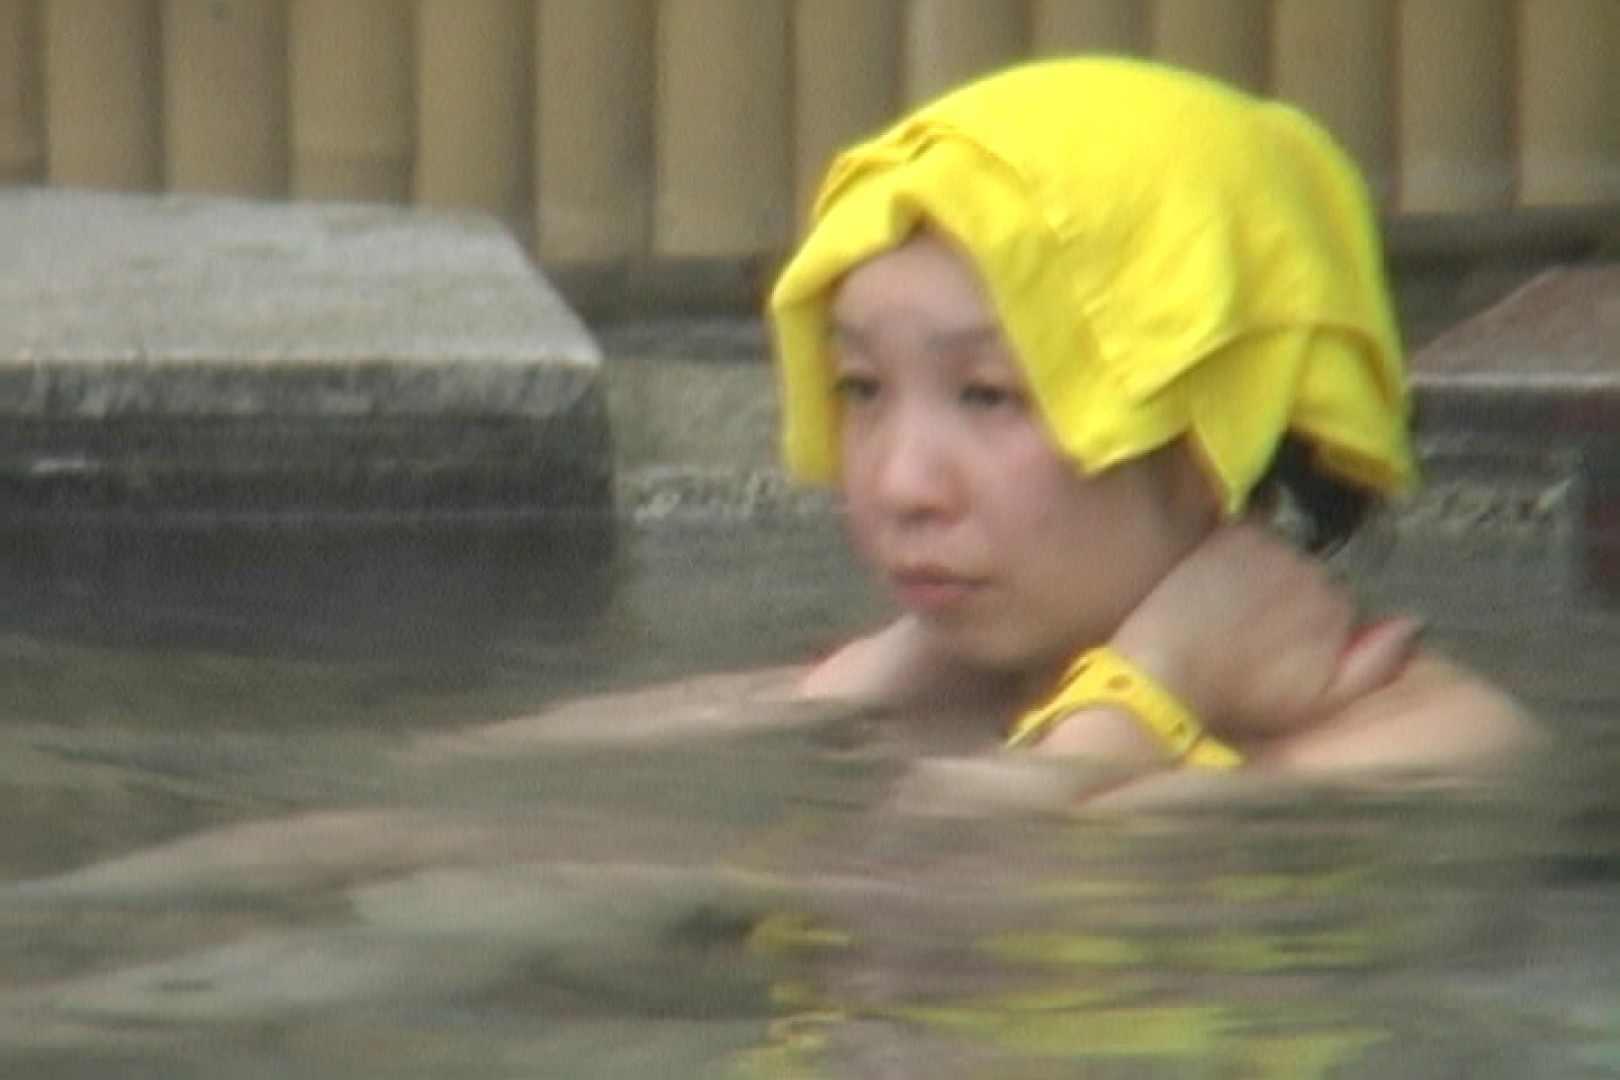 Aquaな露天風呂Vol.542 露天風呂編  113PIX 94